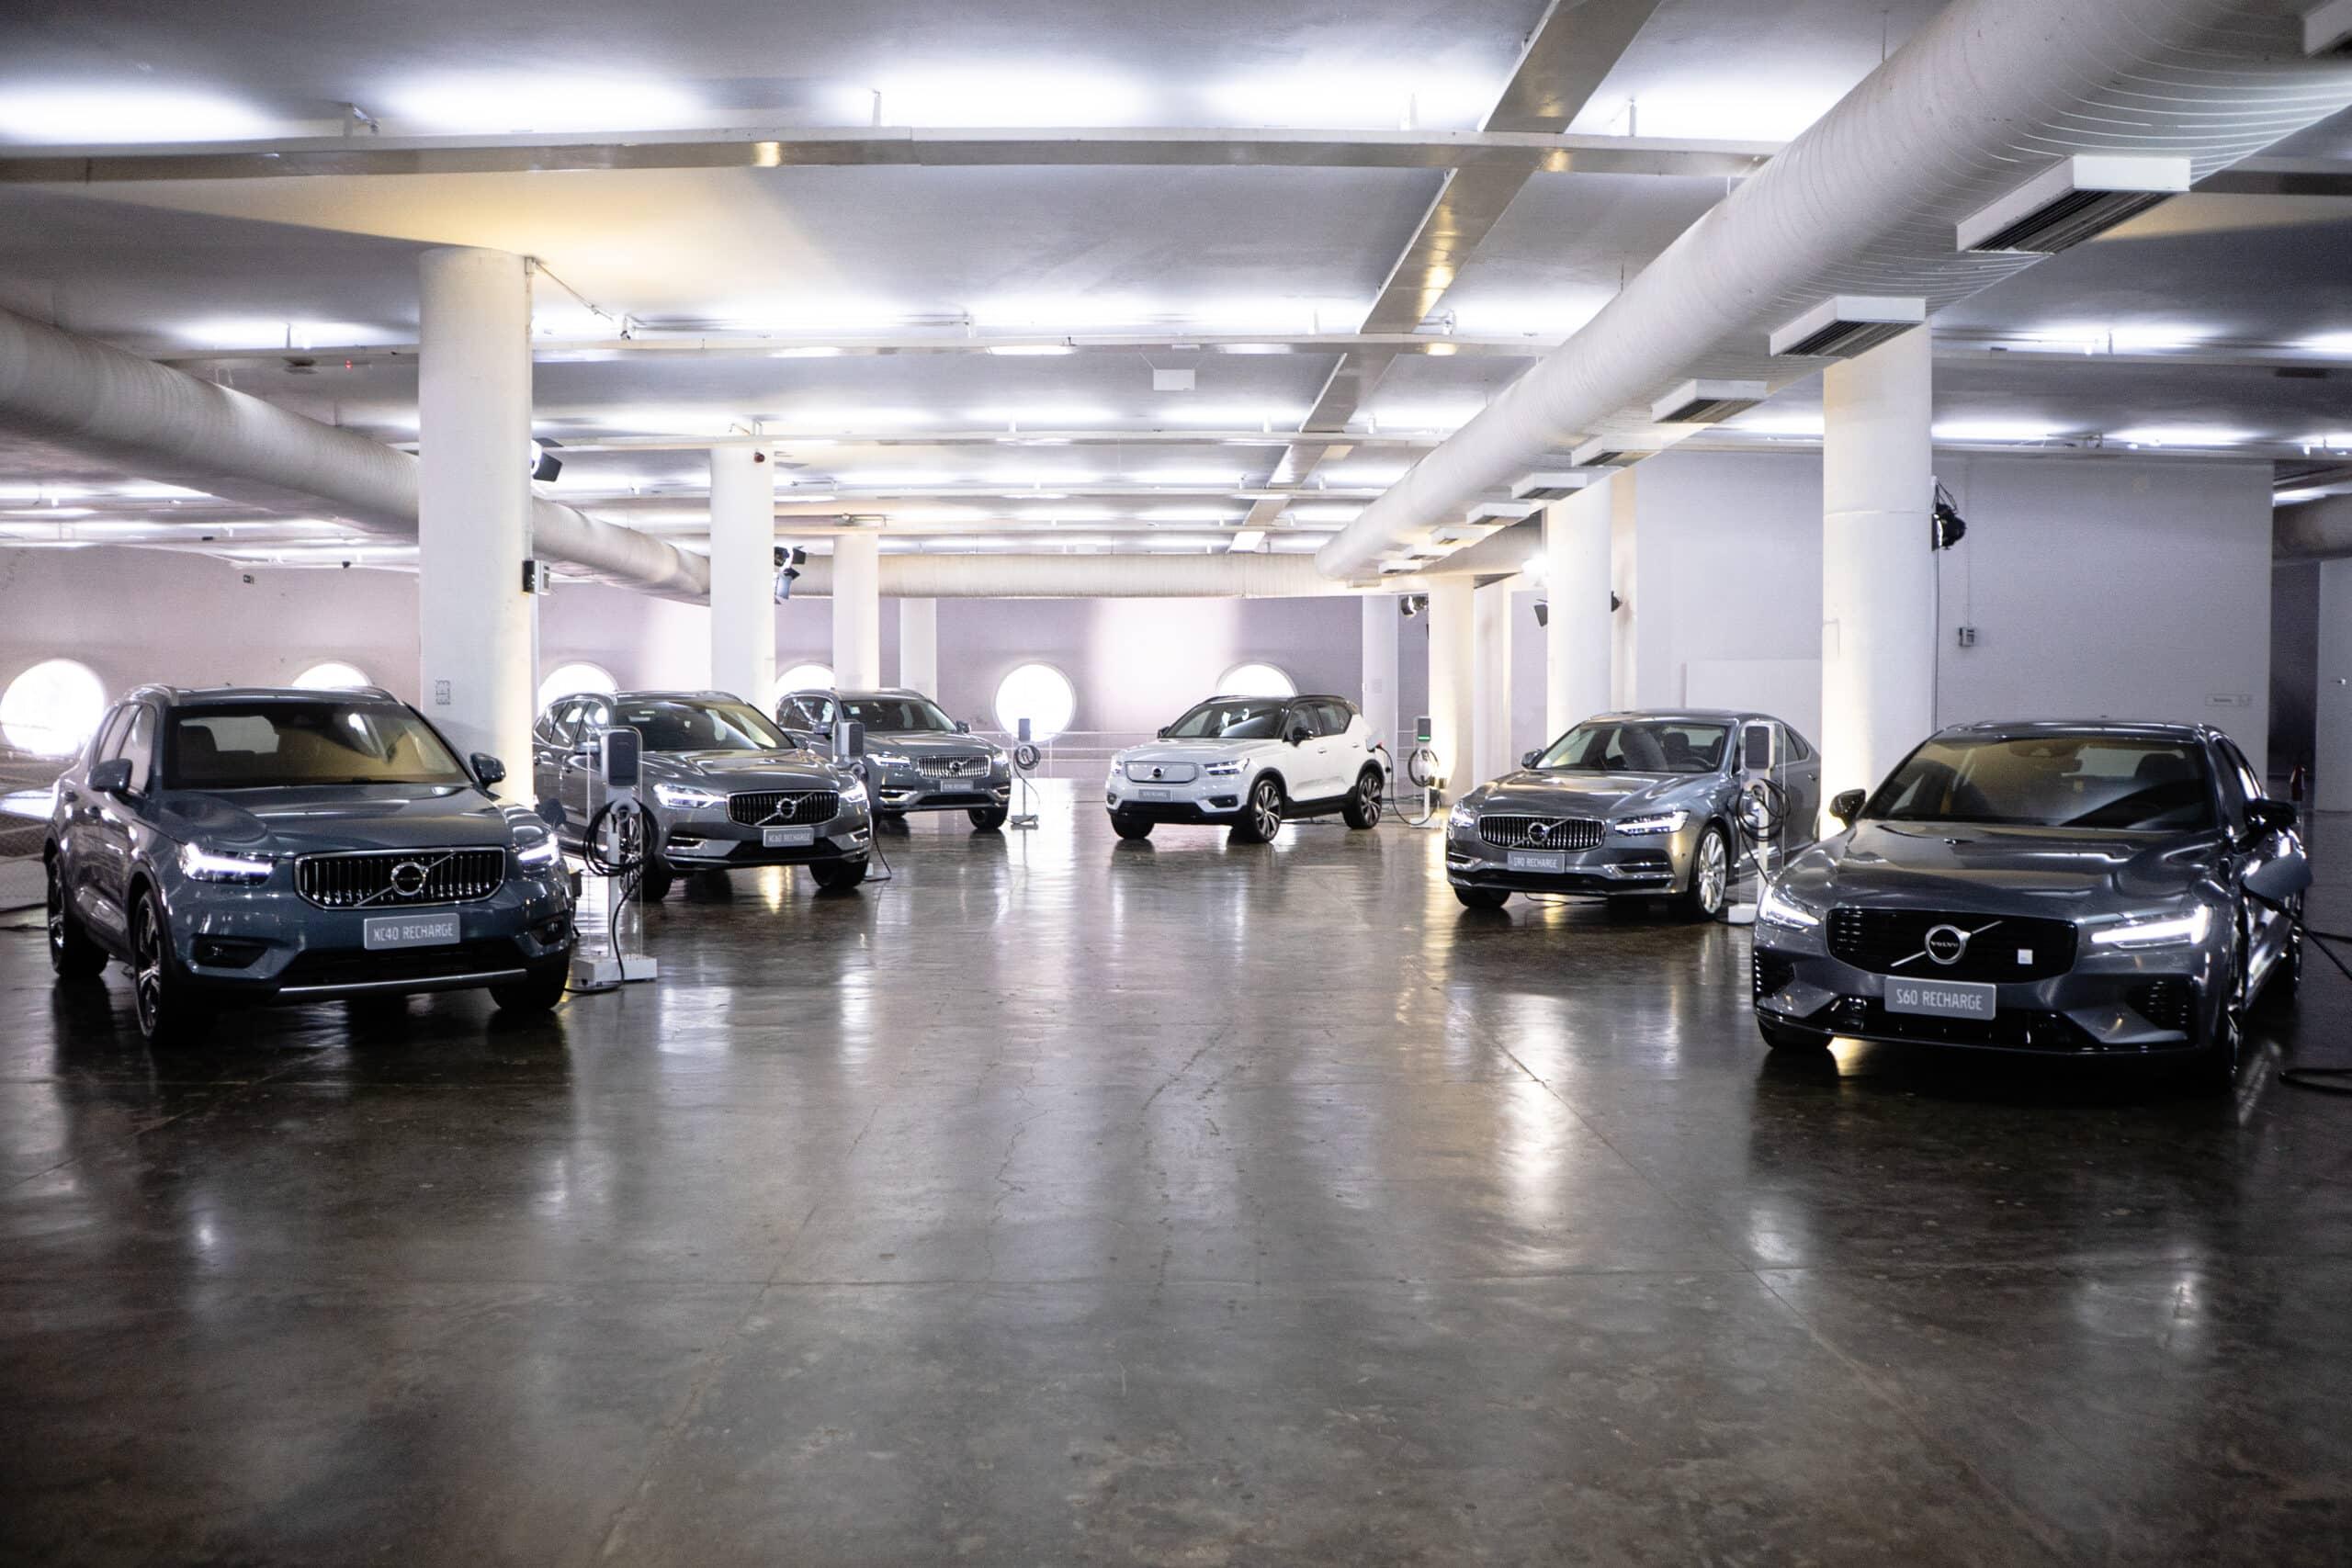 Volvo - motores a combustão - gasolina - diesel